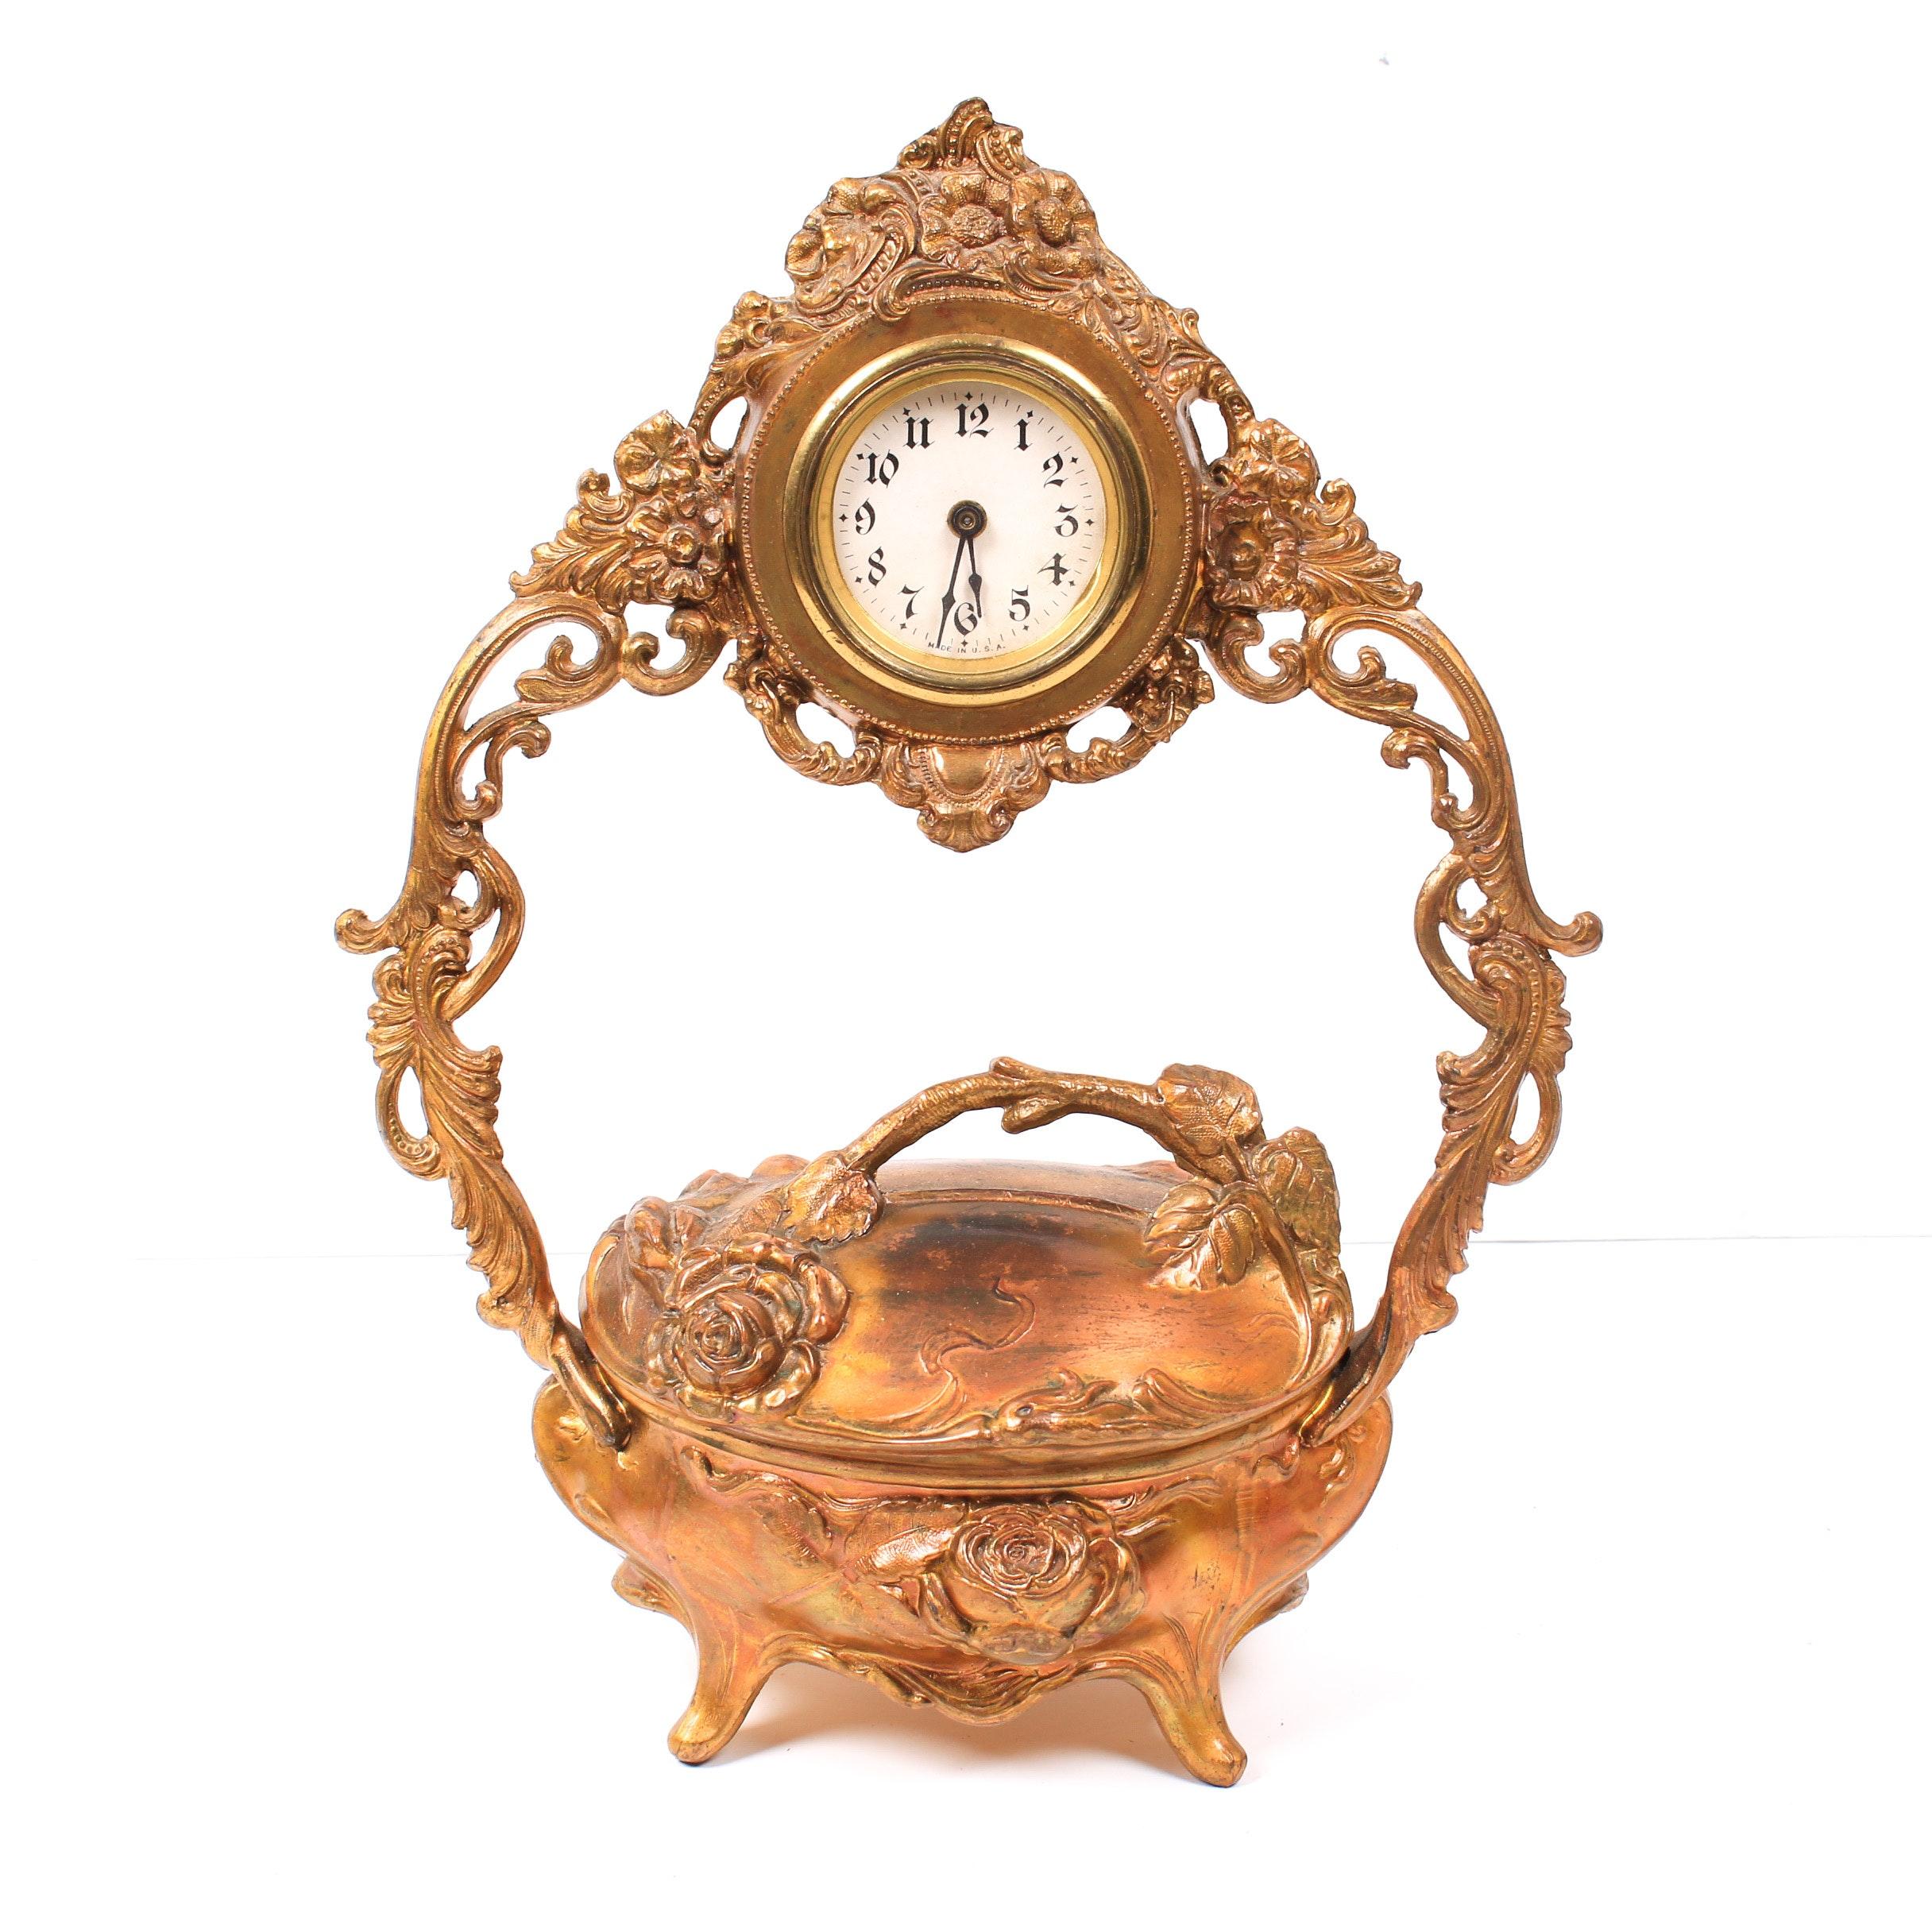 Art Nouveau Vanity Clock with Jewelry Casket